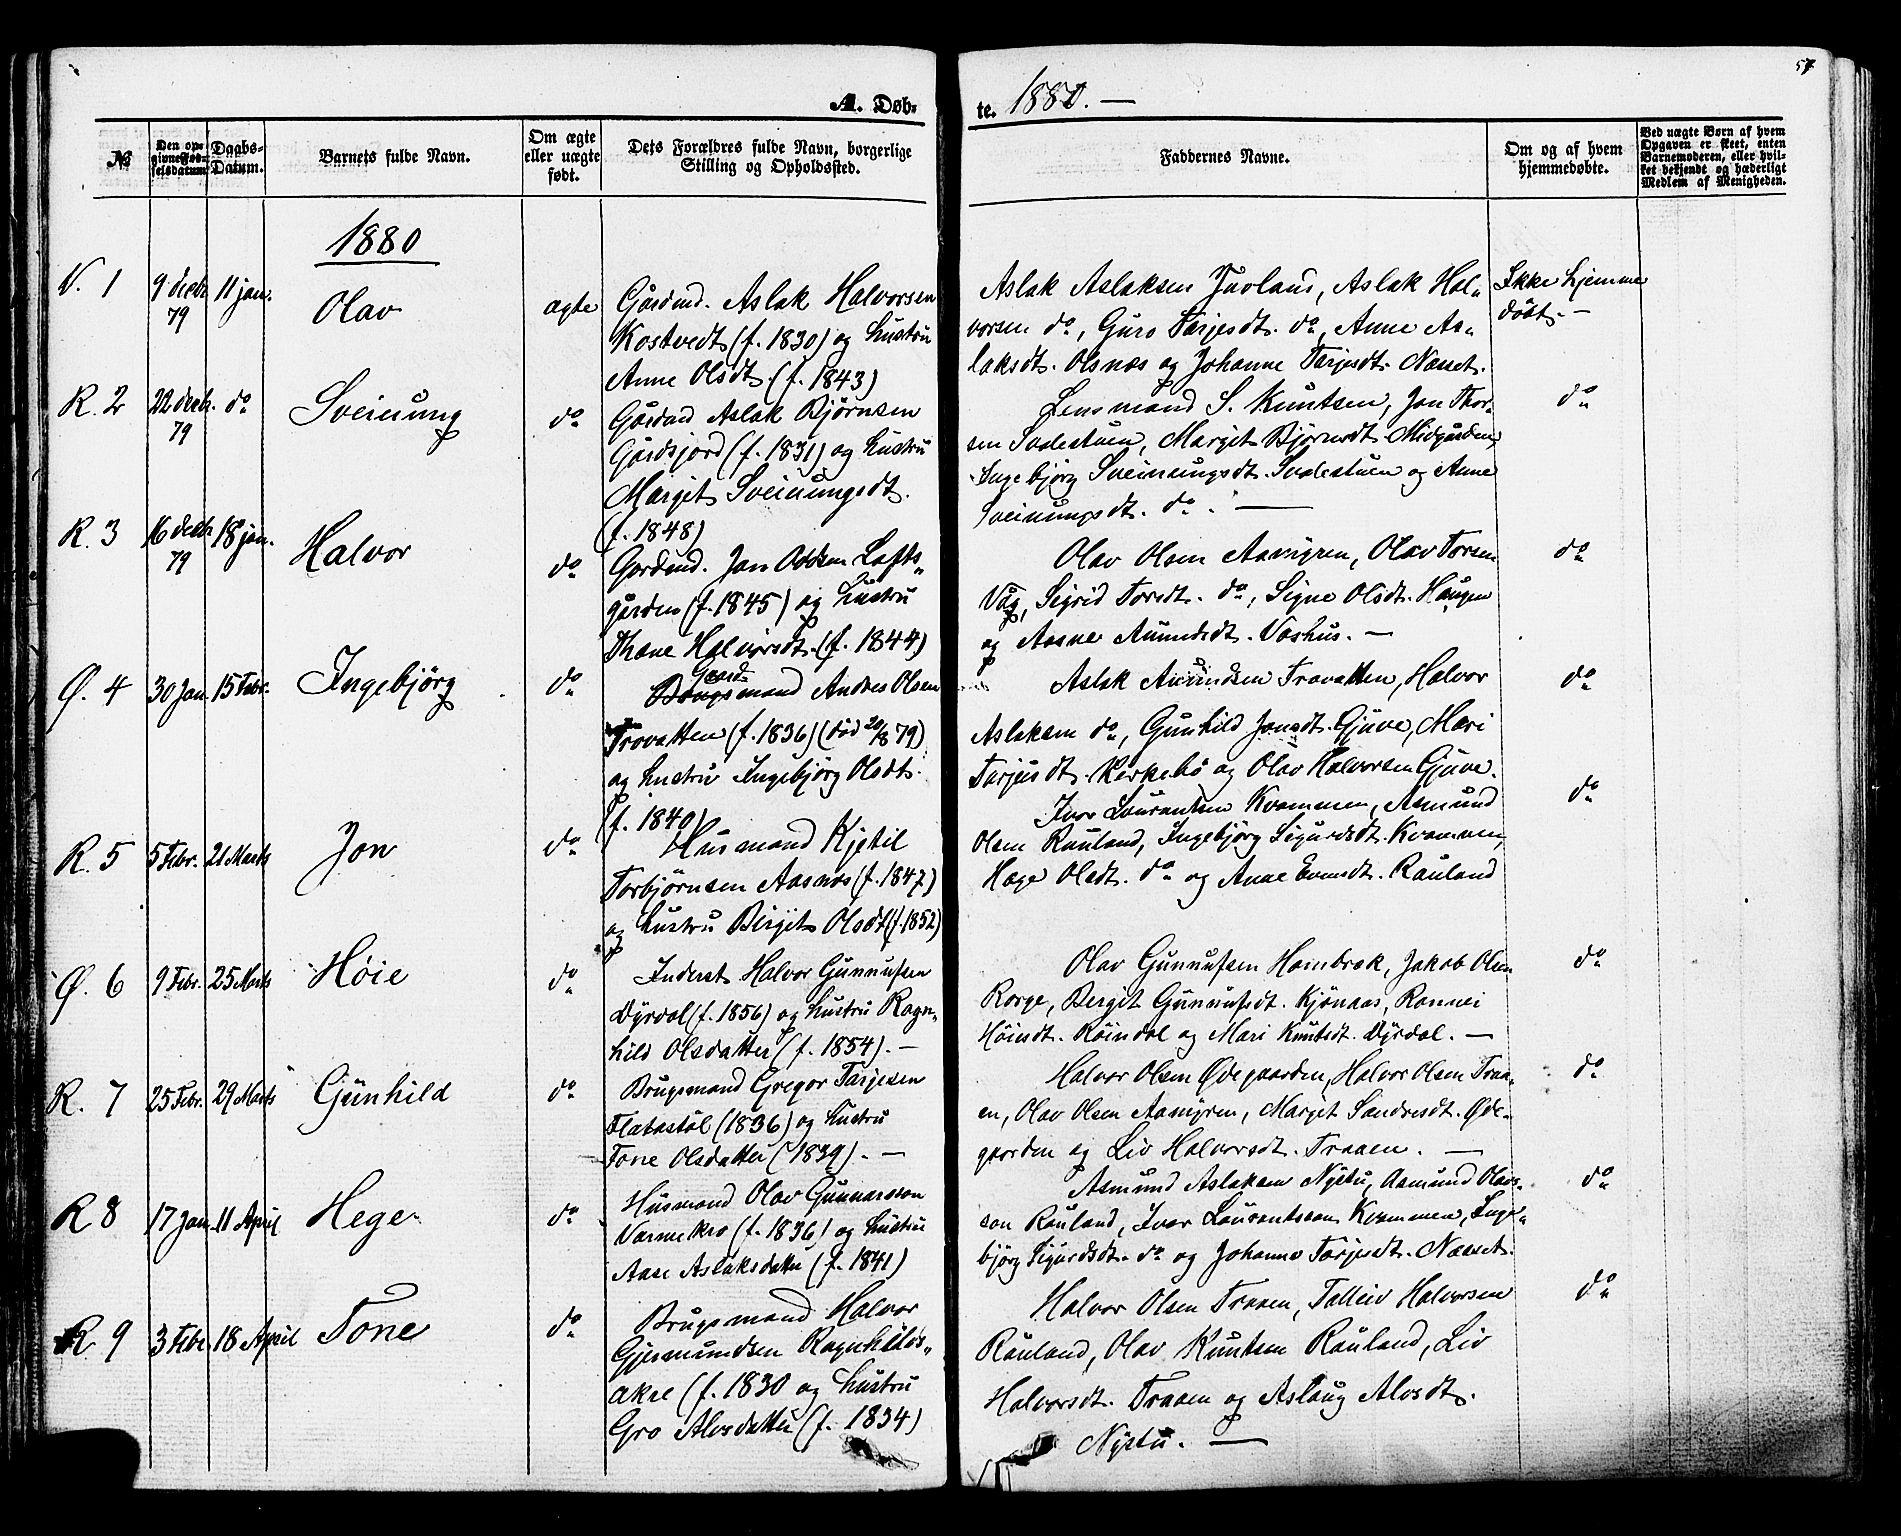 SAKO, Rauland kirkebøker, F/Fa/L0003: Ministerialbok nr. 3, 1859-1886, s. 57